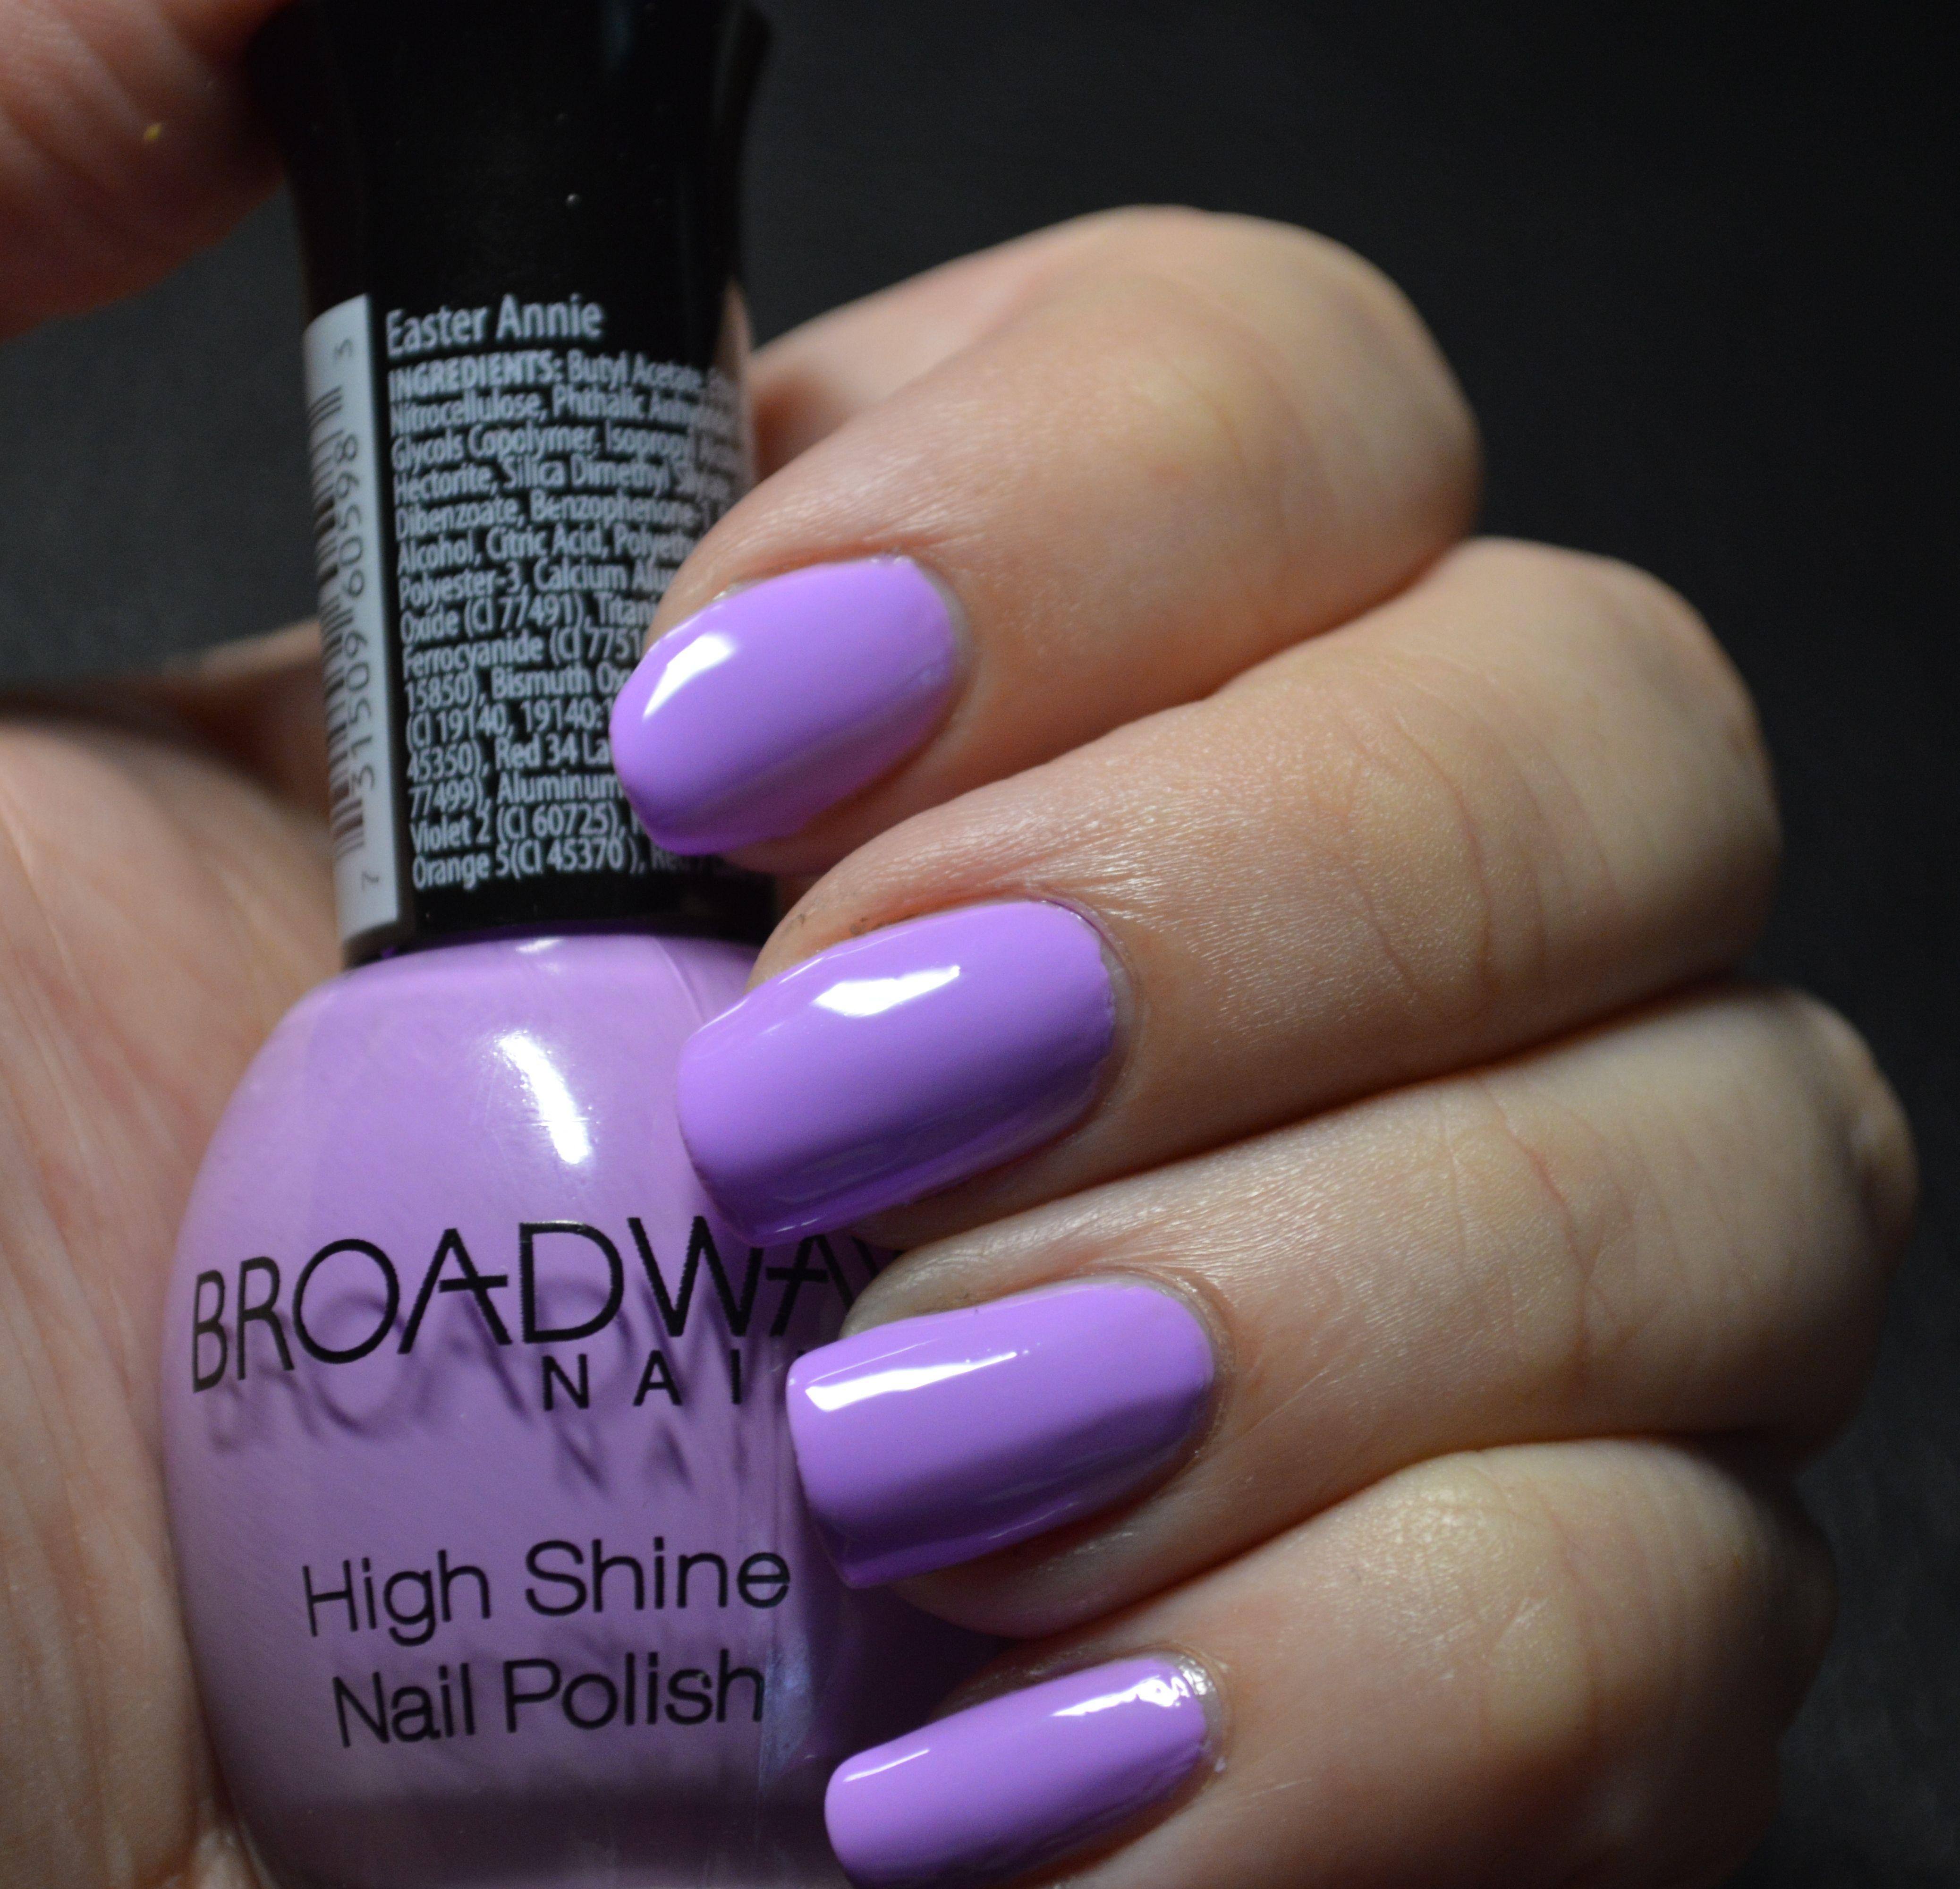 #broadwaynails in #easterannie